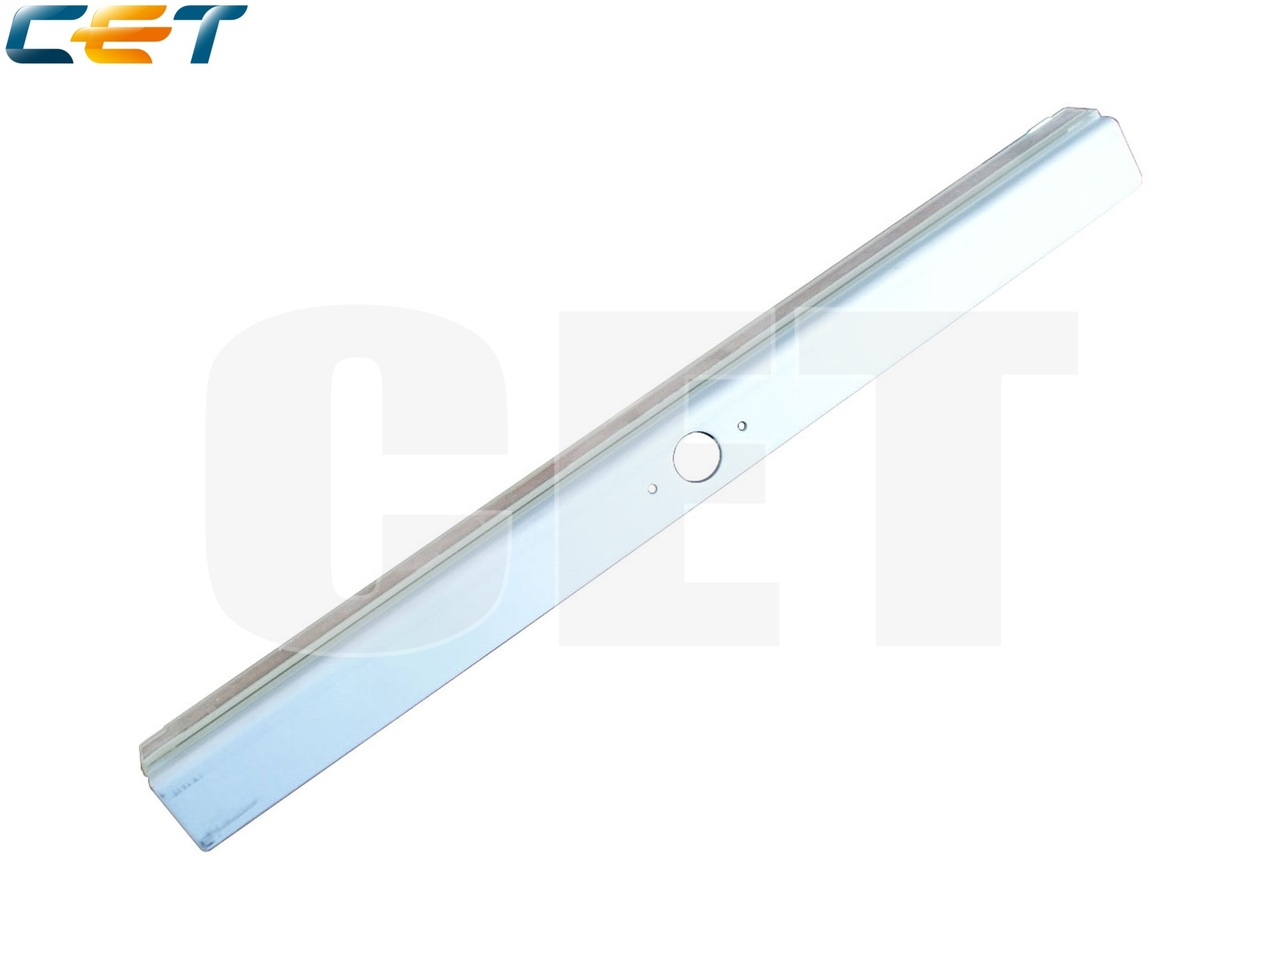 Ракель 6LE19374000 для TOSHIBA E-Studio 555/655/755/855(CET), CET6594